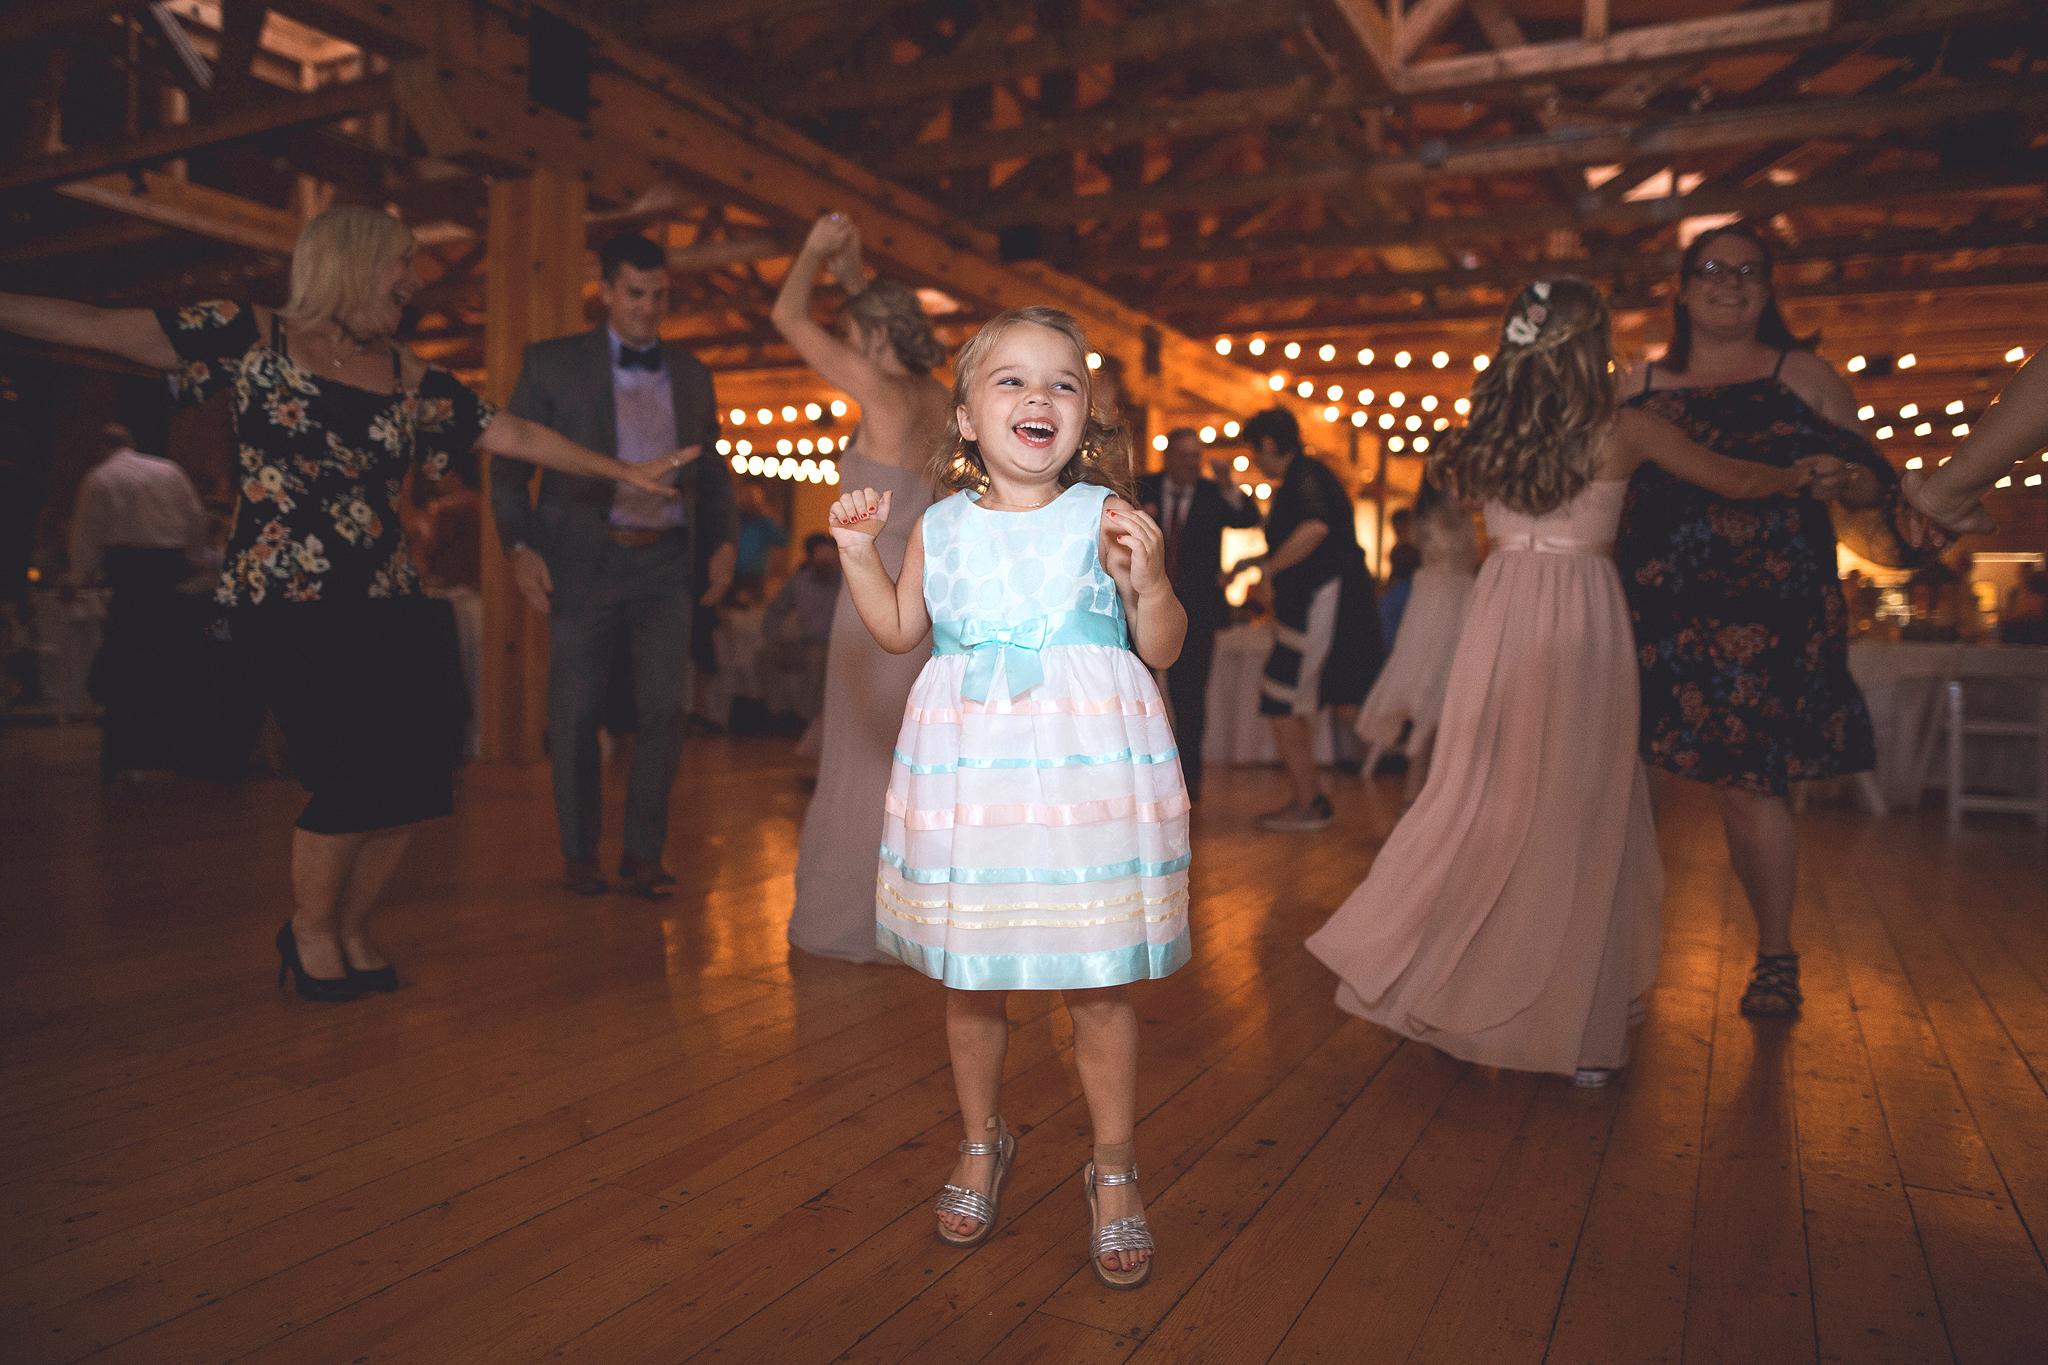 Cincinnati-Dayton-OH-Traveling-Wedding-Photographer-Rhinegeist-Brewery-Ault-Park-21C-166.jpg